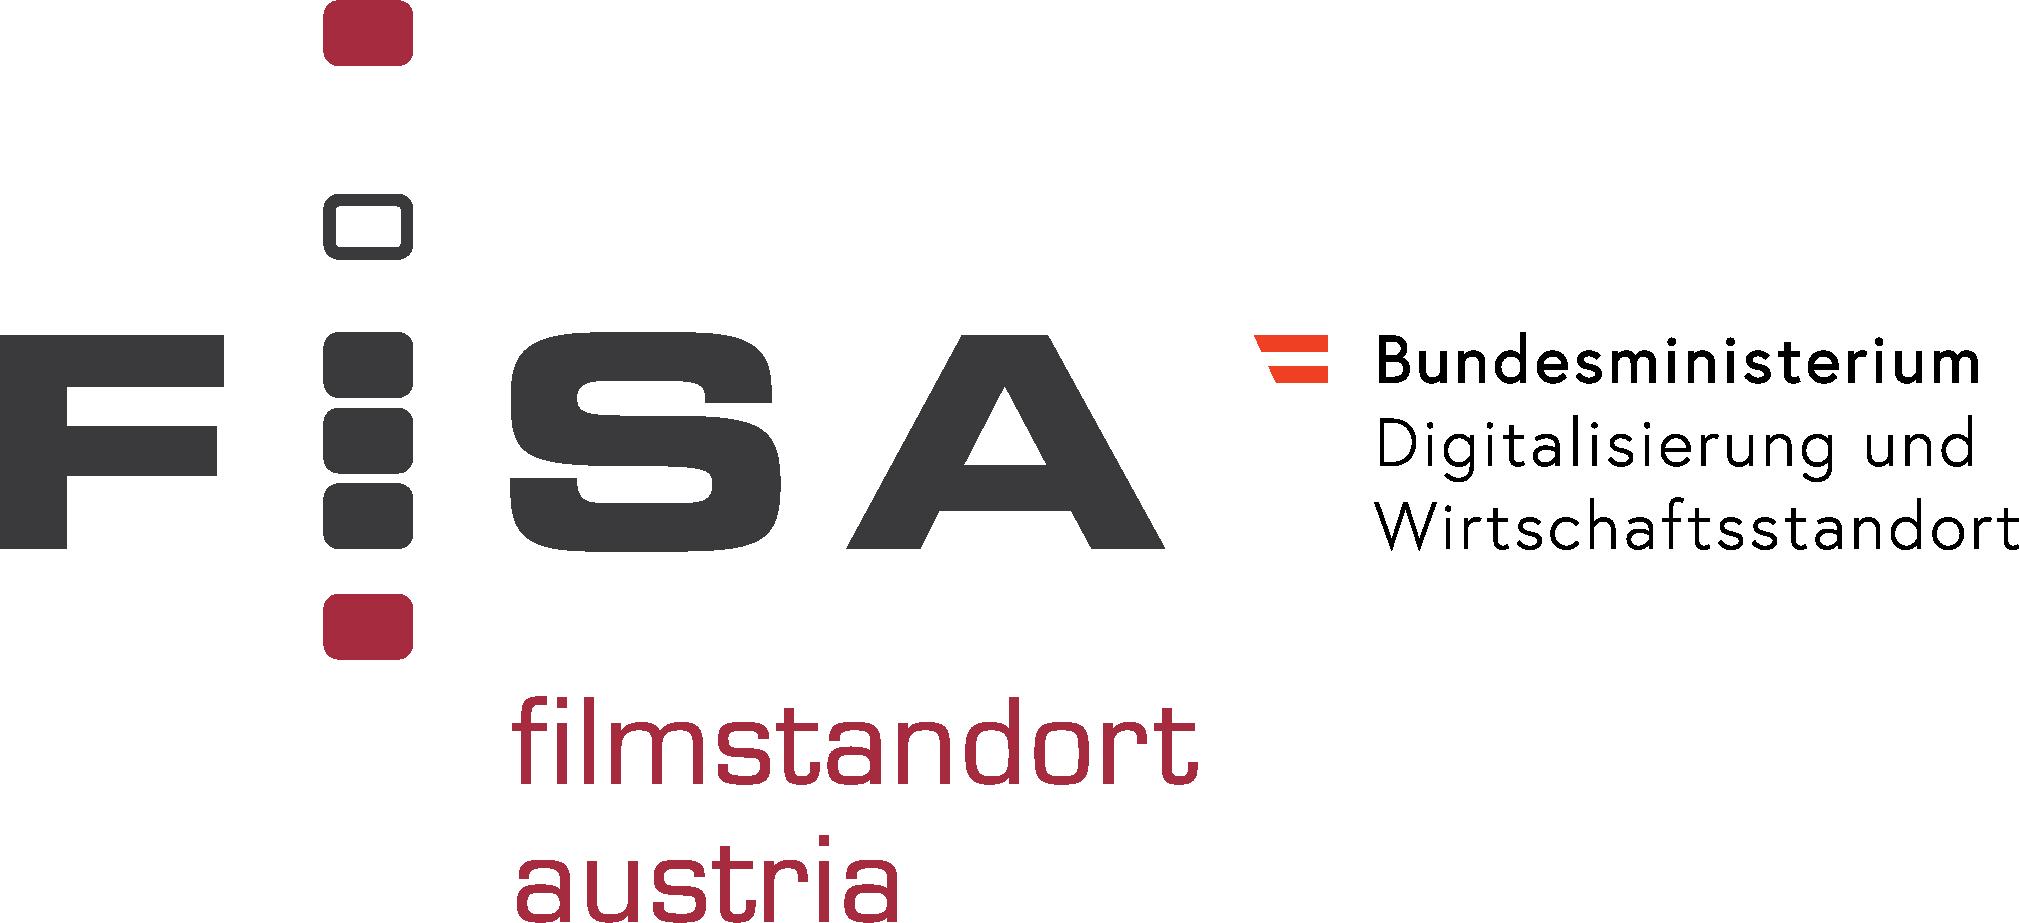 FISA - filmstandort austria